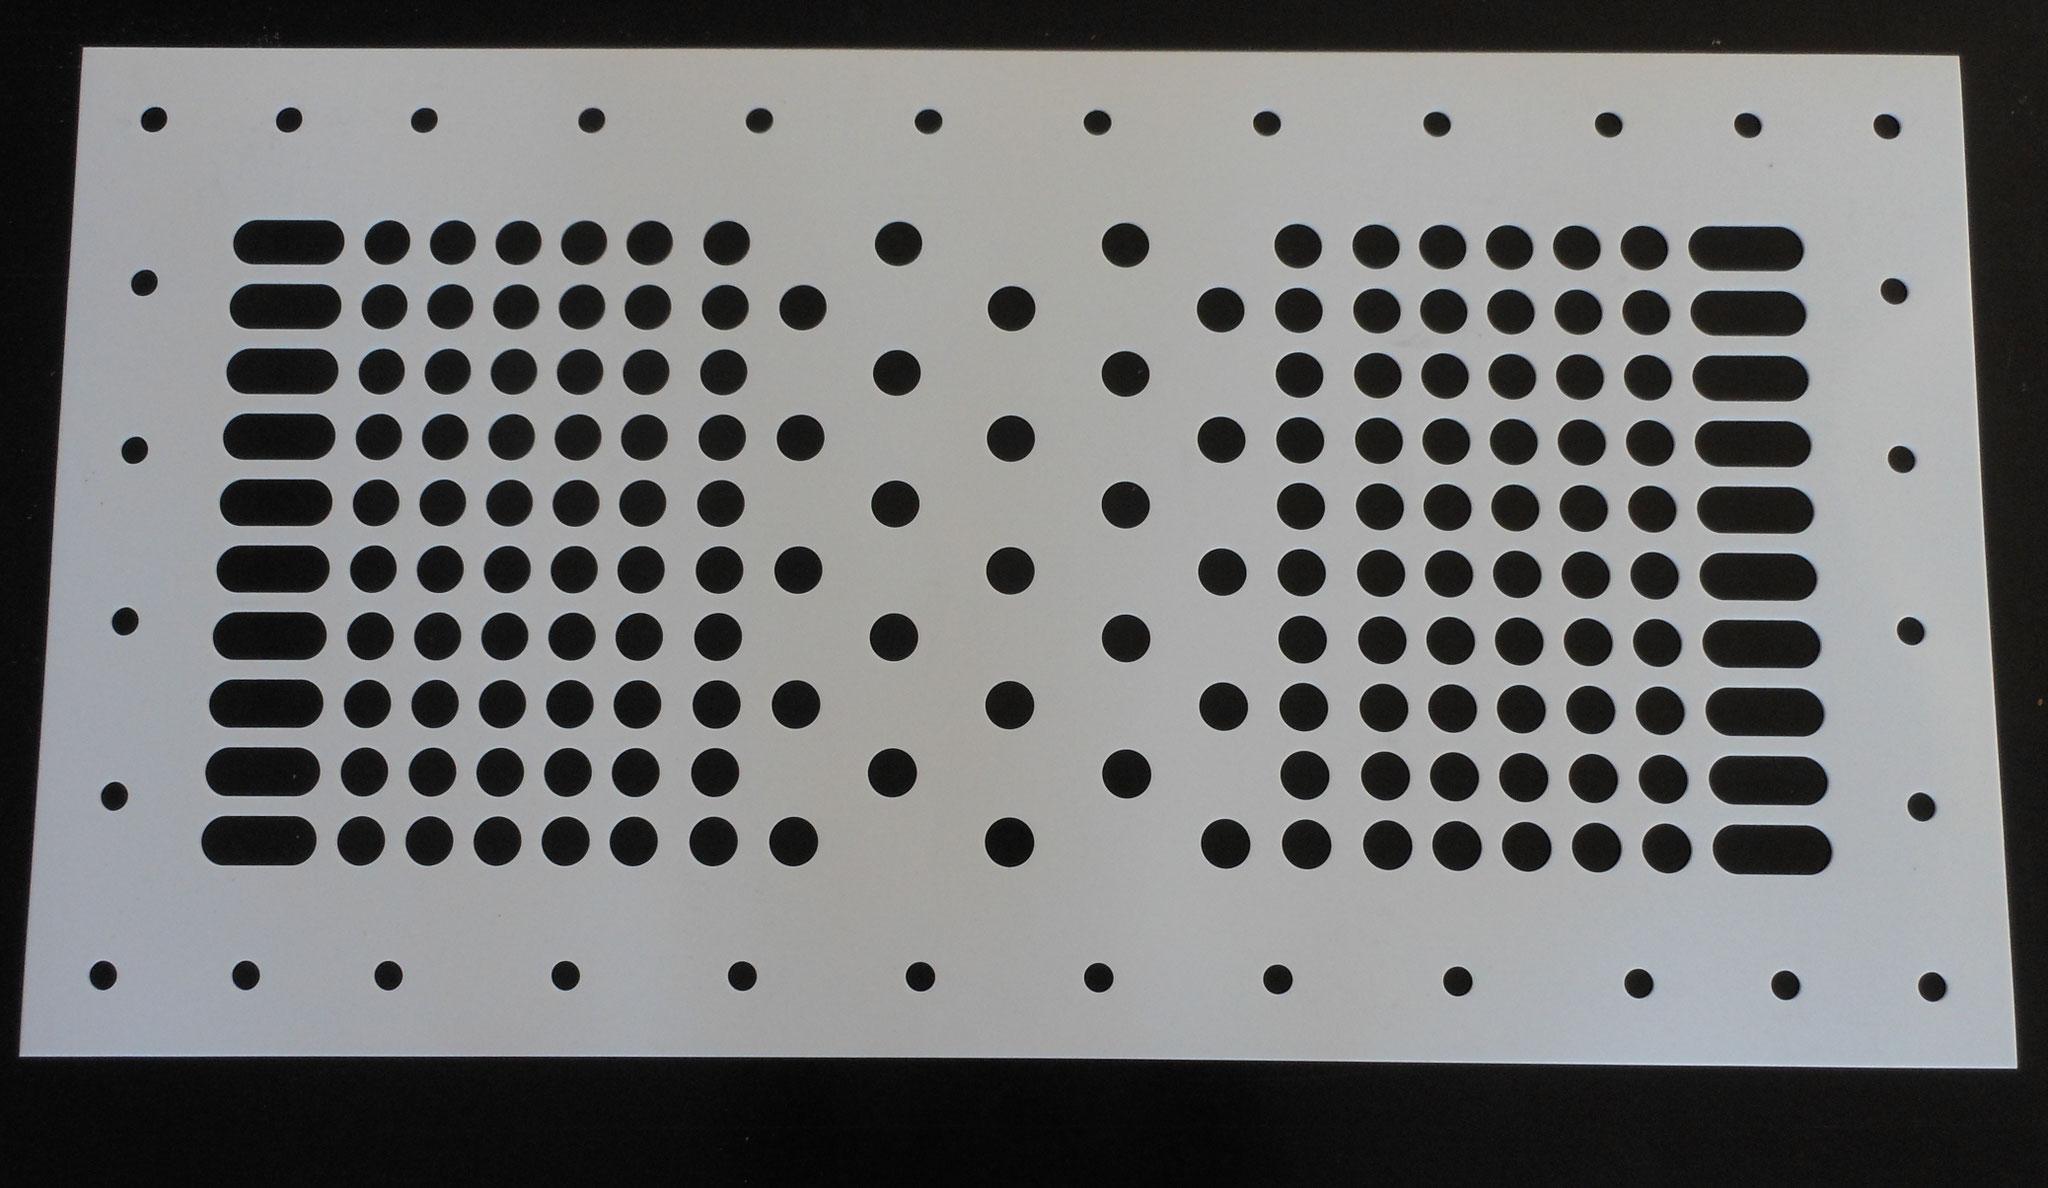 Lochplatte PTFE 3mm